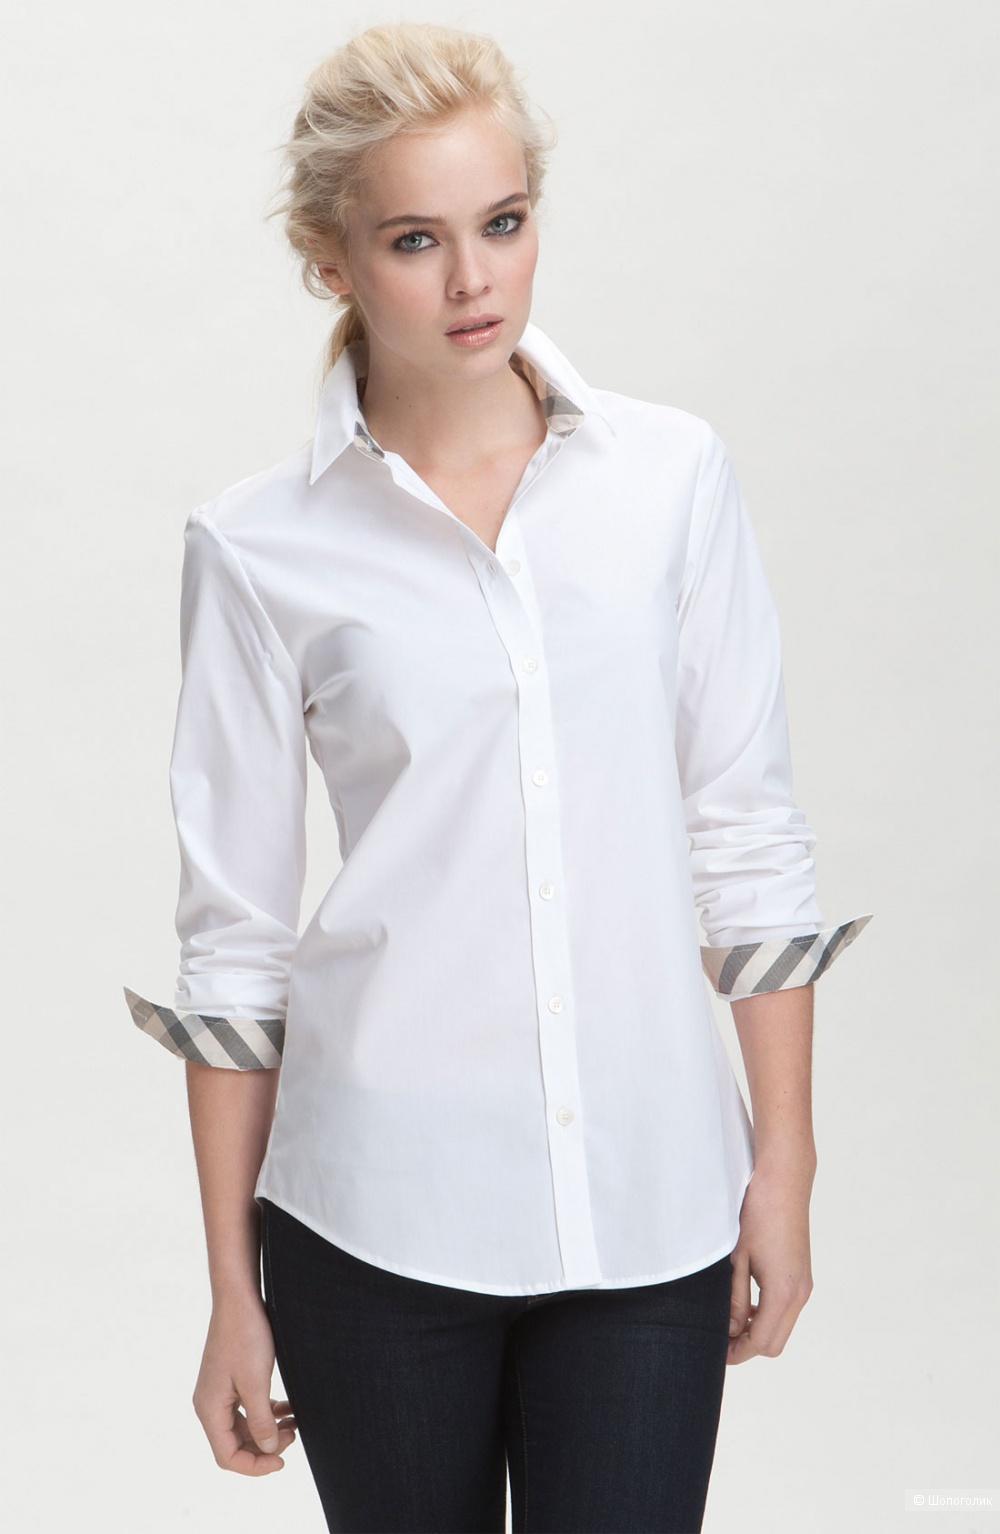 размер рубашки м в цифрах